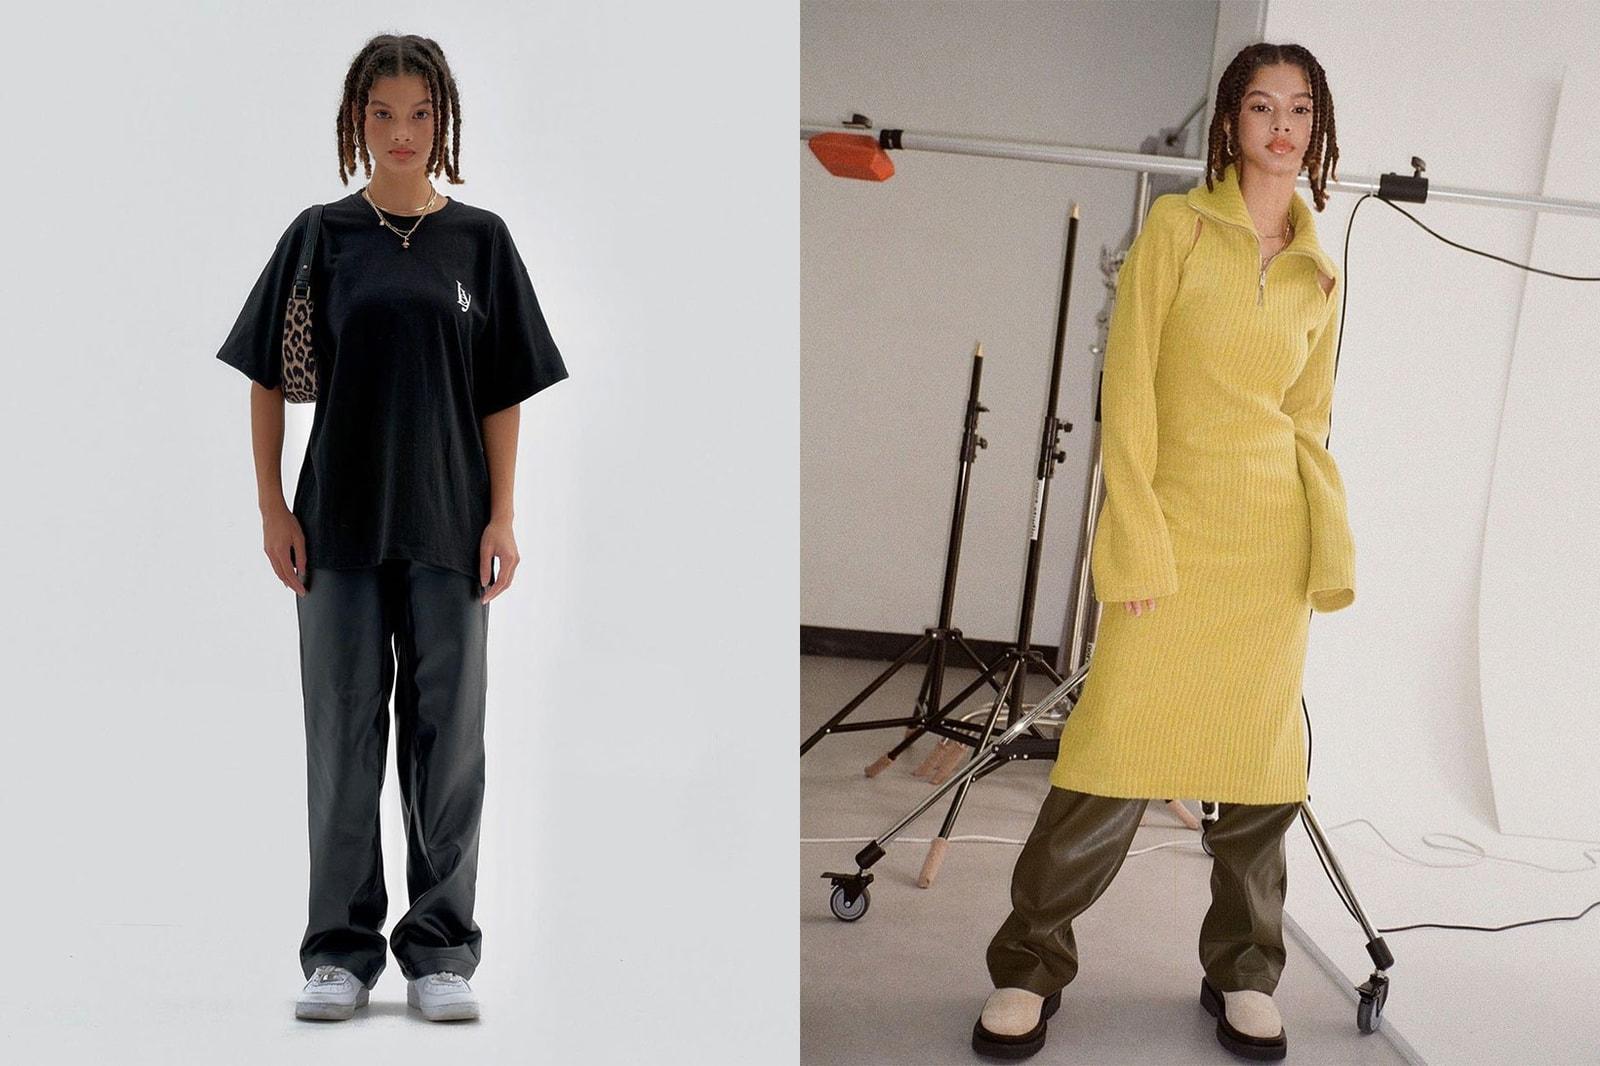 korean fashion emerging female fashion designers brands leey knit ribbed dress t-shirt trousers